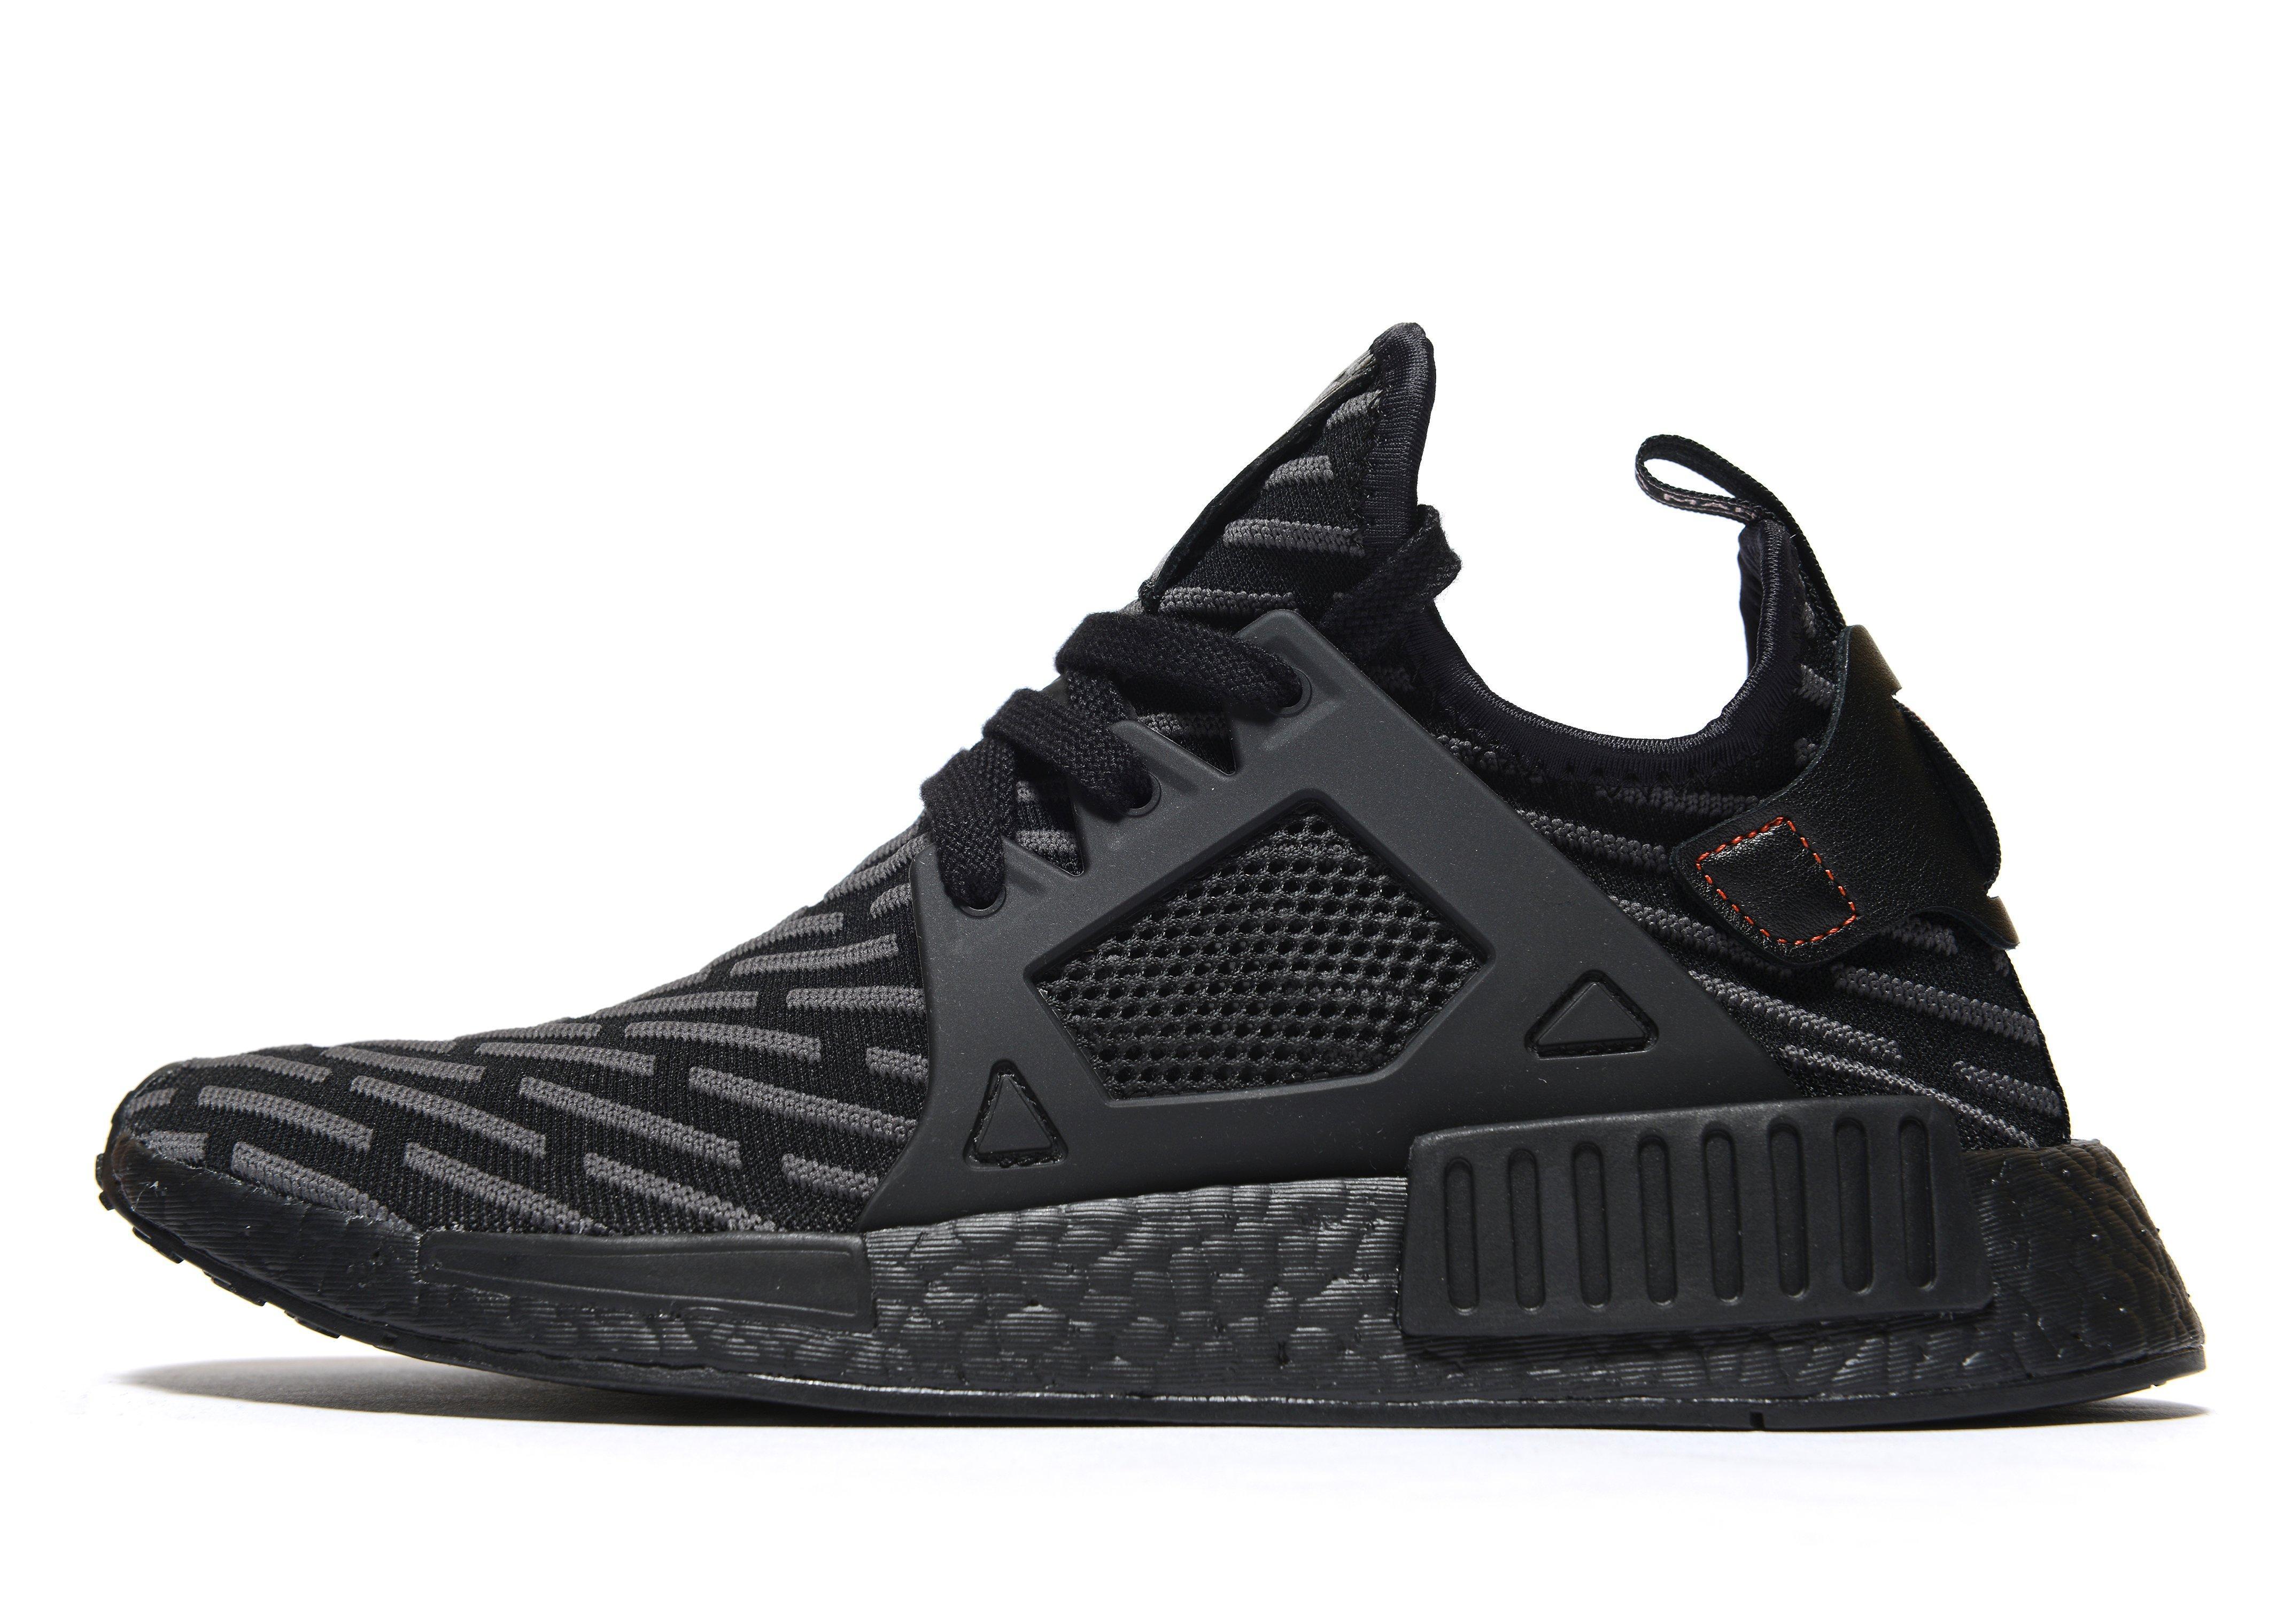 Adidas Originals Rubber Nmd Xr1 Primeknit In Black For Men